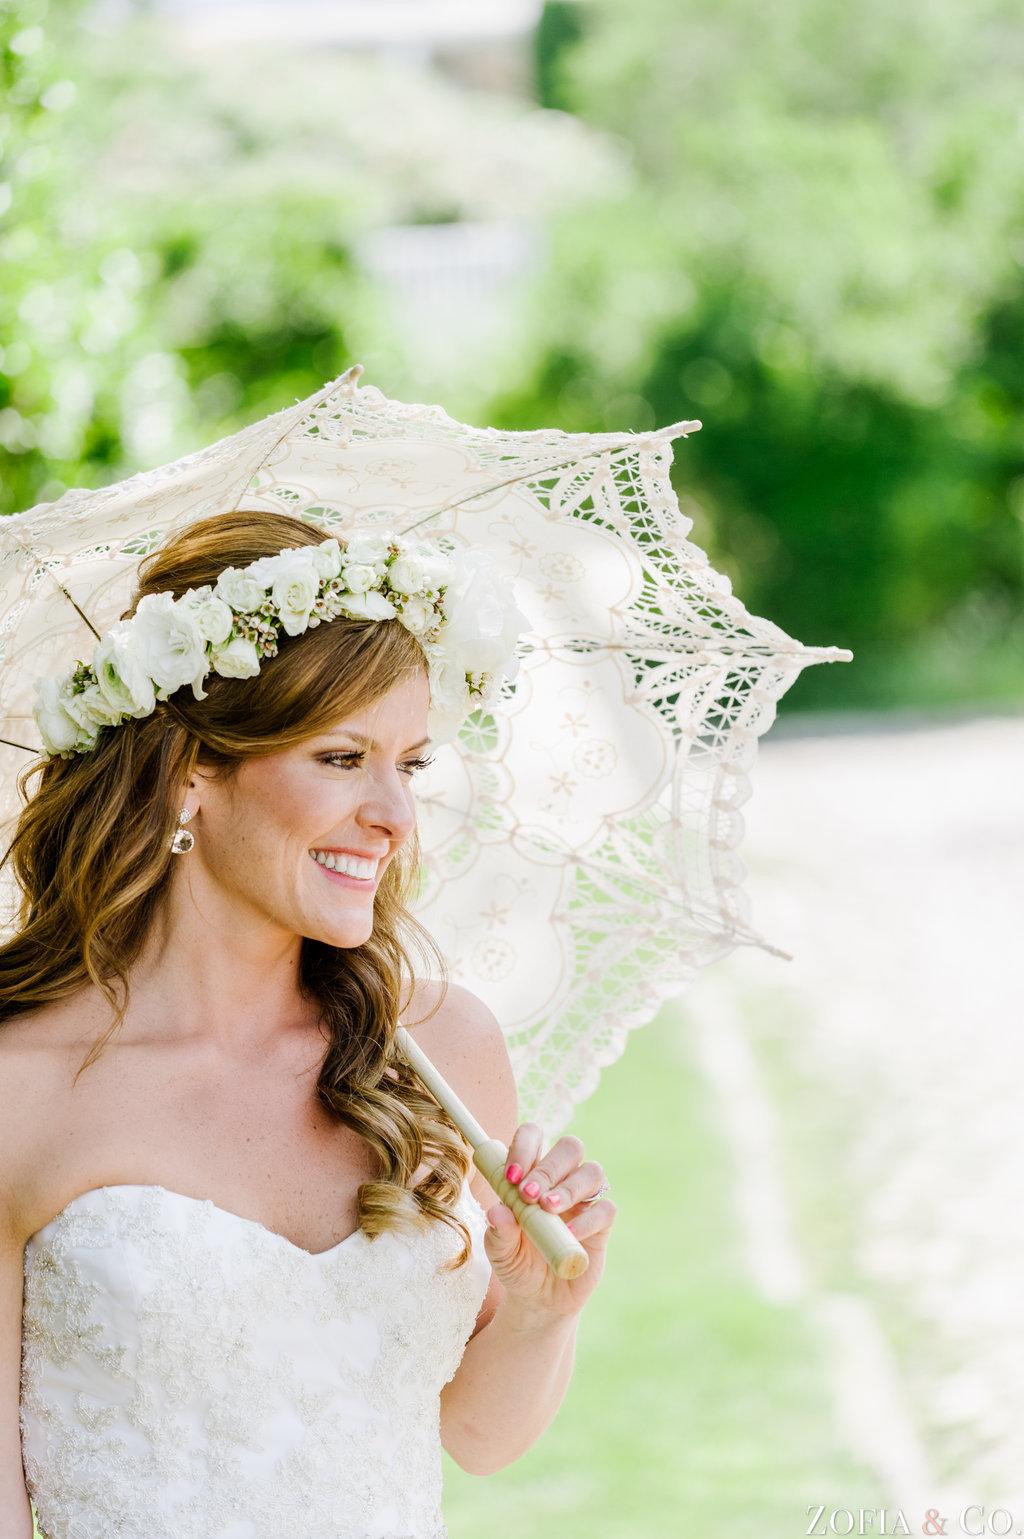 Ceci_New_York_Style_Luxury_Custom_Summer_Wedding_CeciBride_Nautical_Blue_Gold_Letterpress_Foil_151.jpg